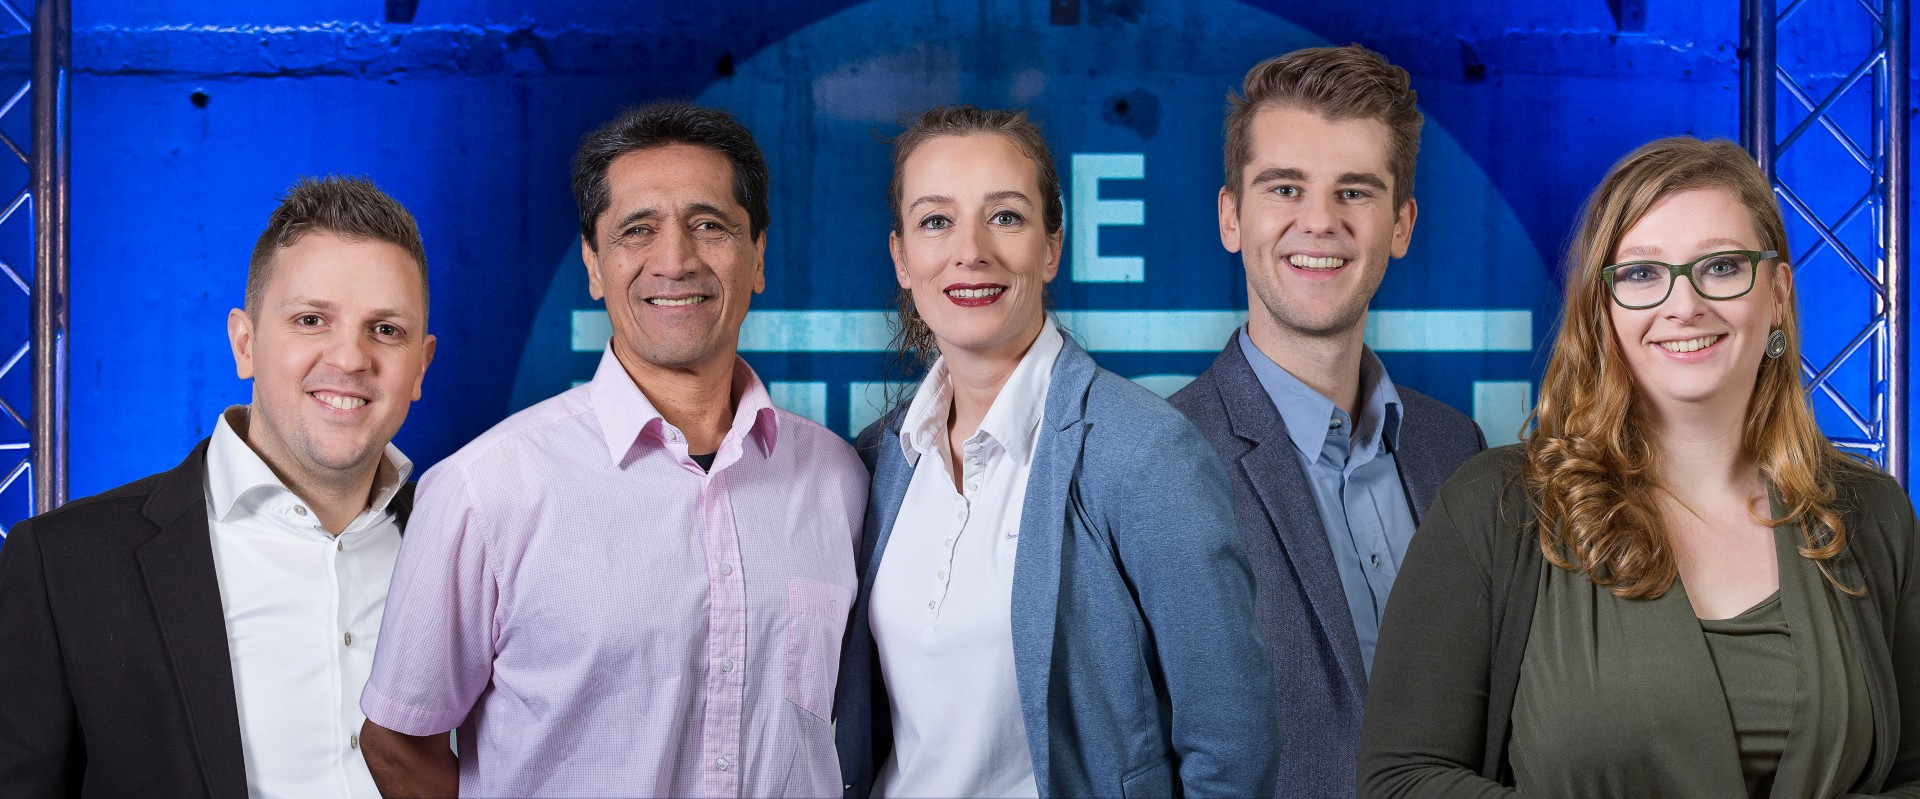 Kandidaten televisieprogramma De Pitch seizoen 2 bekend